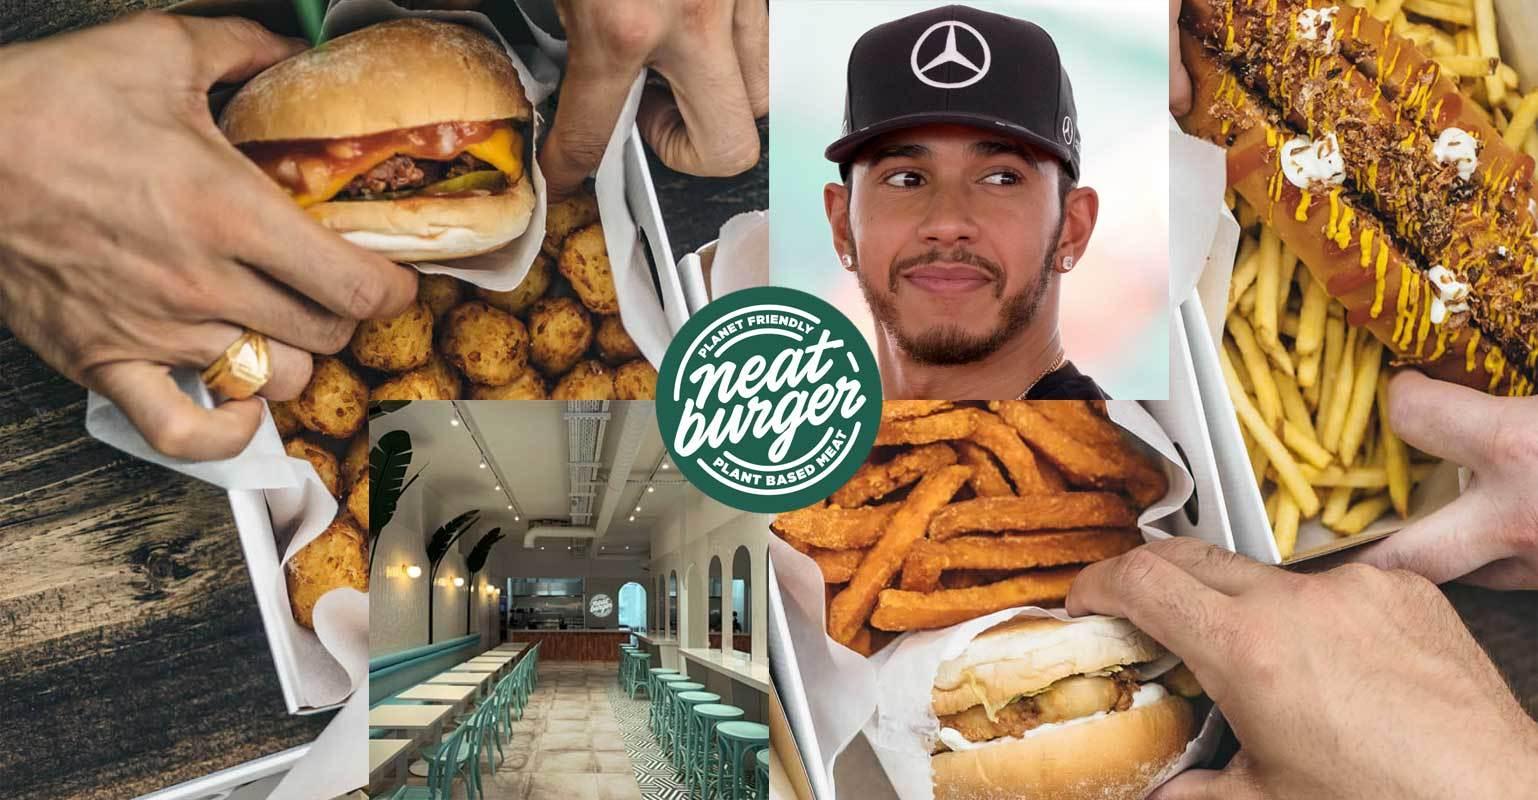 neat-burger-lewis-hamilton.jpg